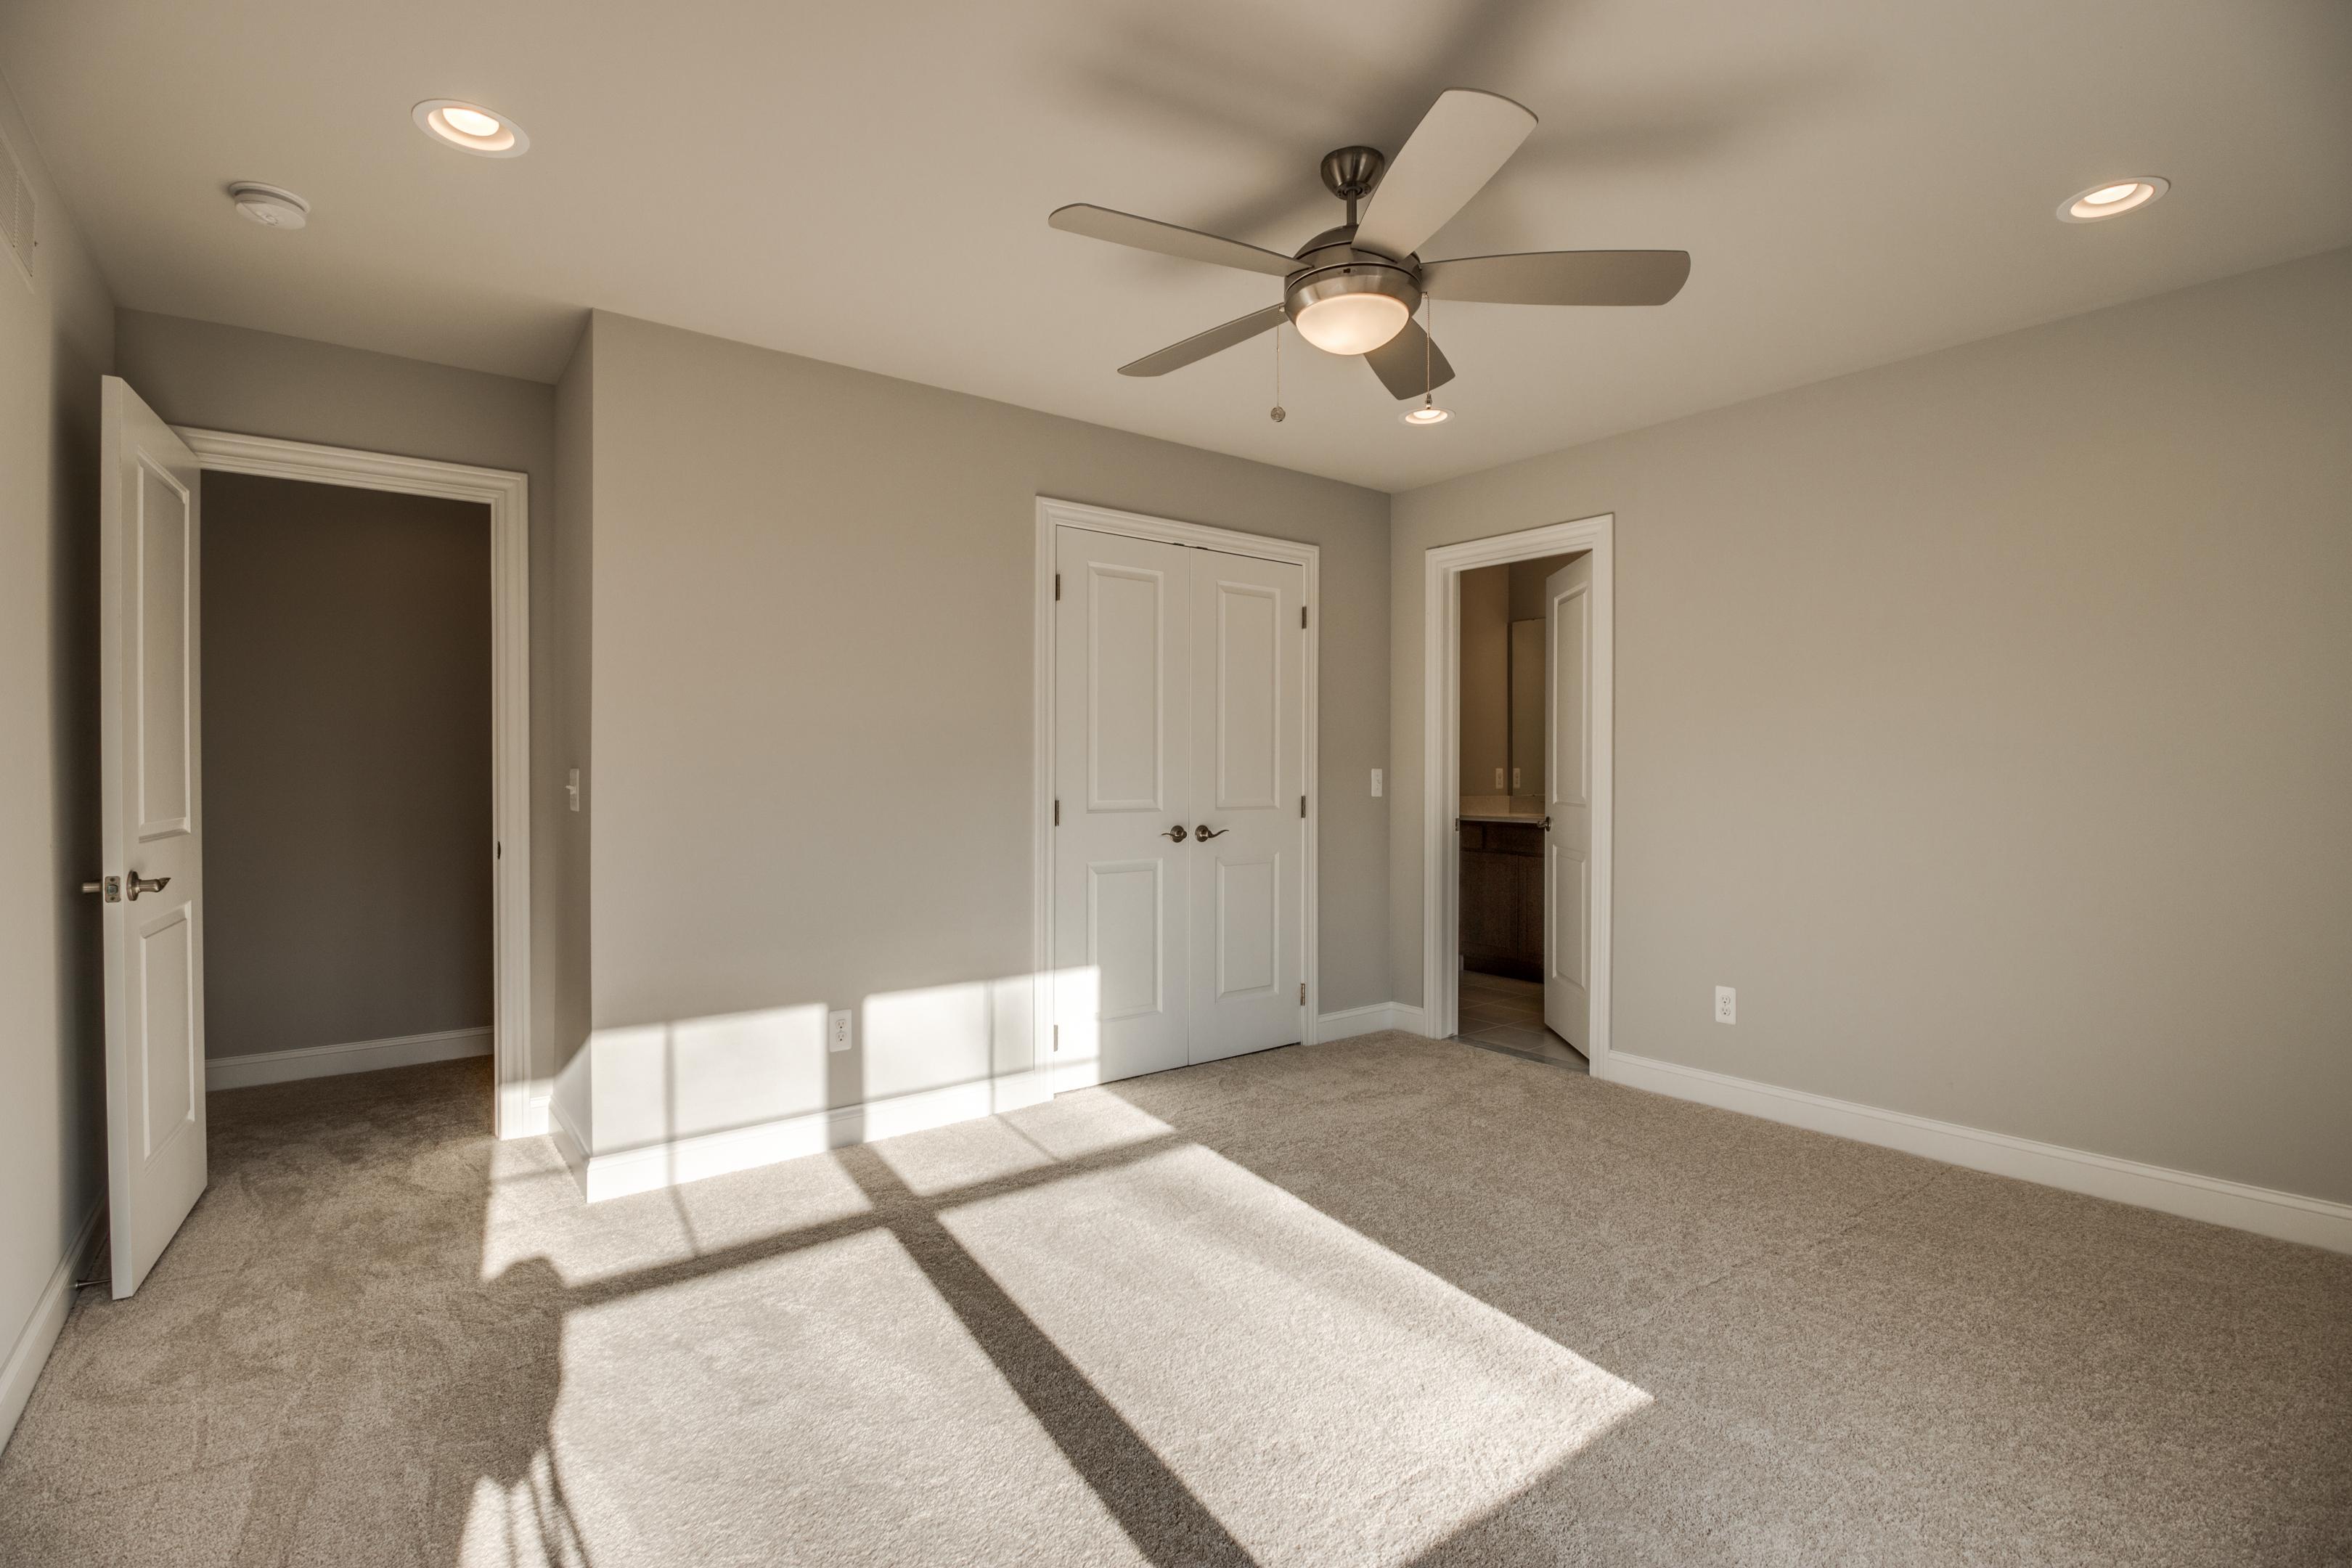 Interiors 32.jpg